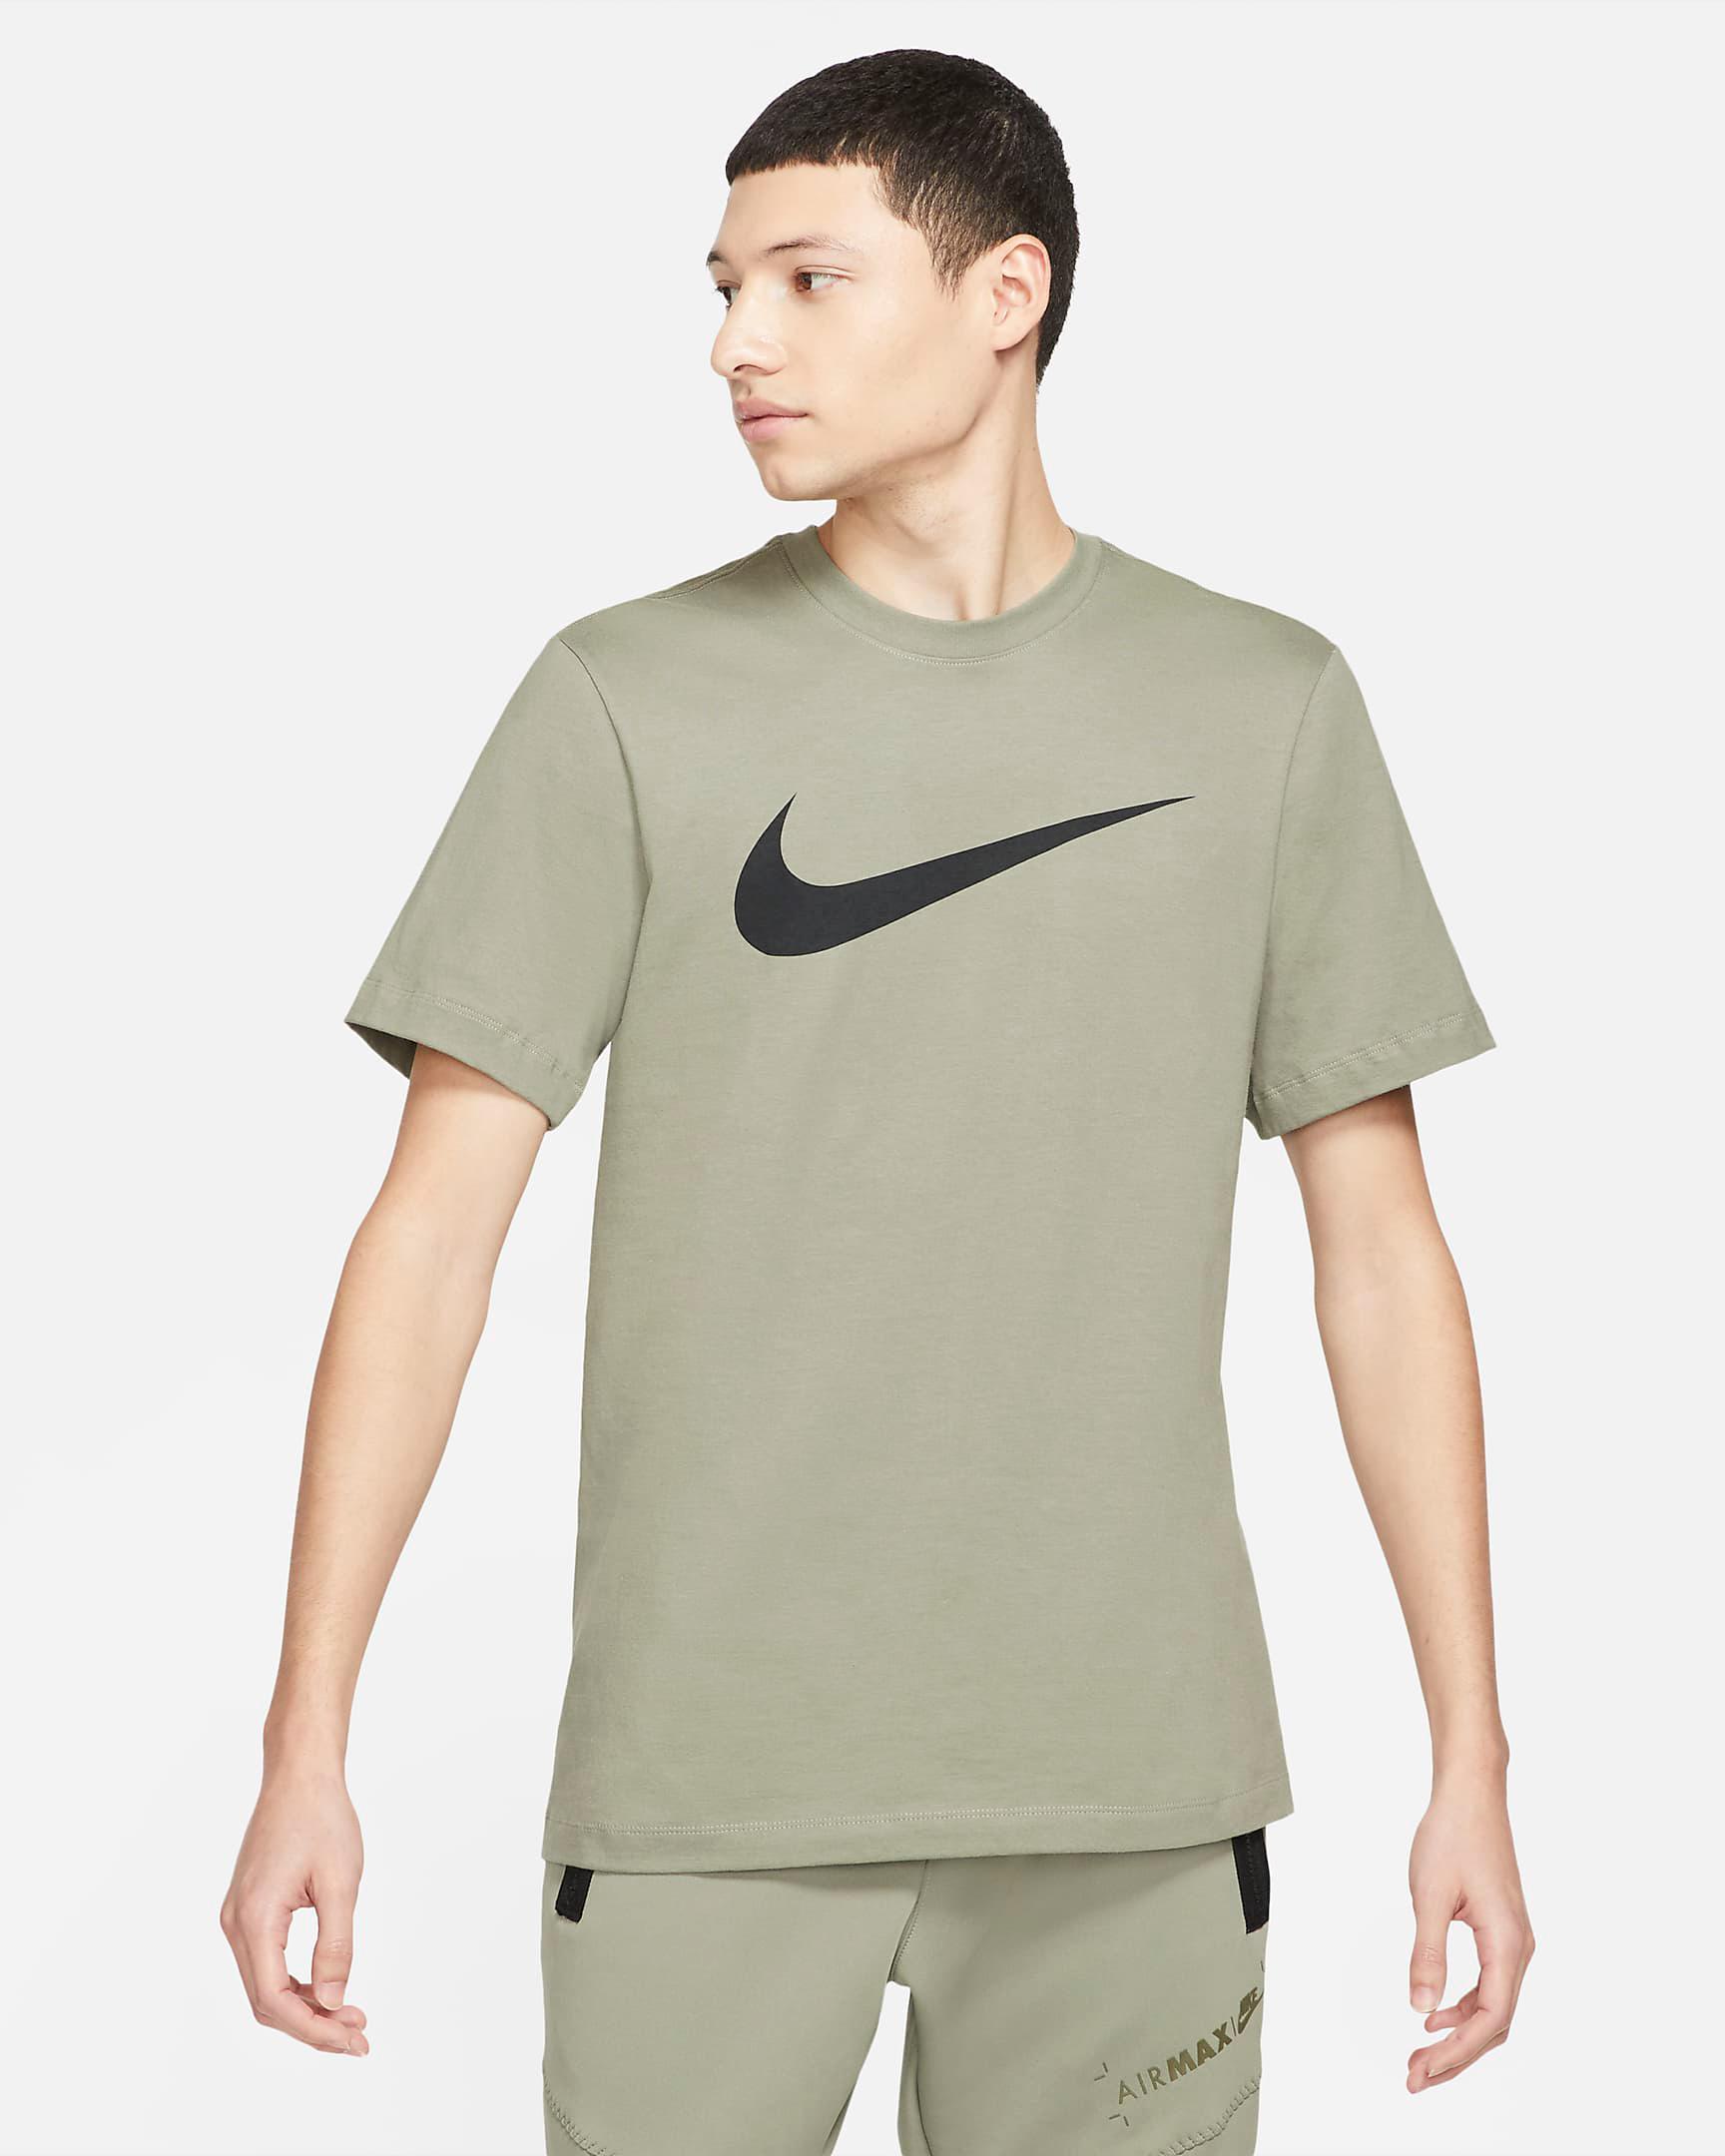 nike-light-army-shirt